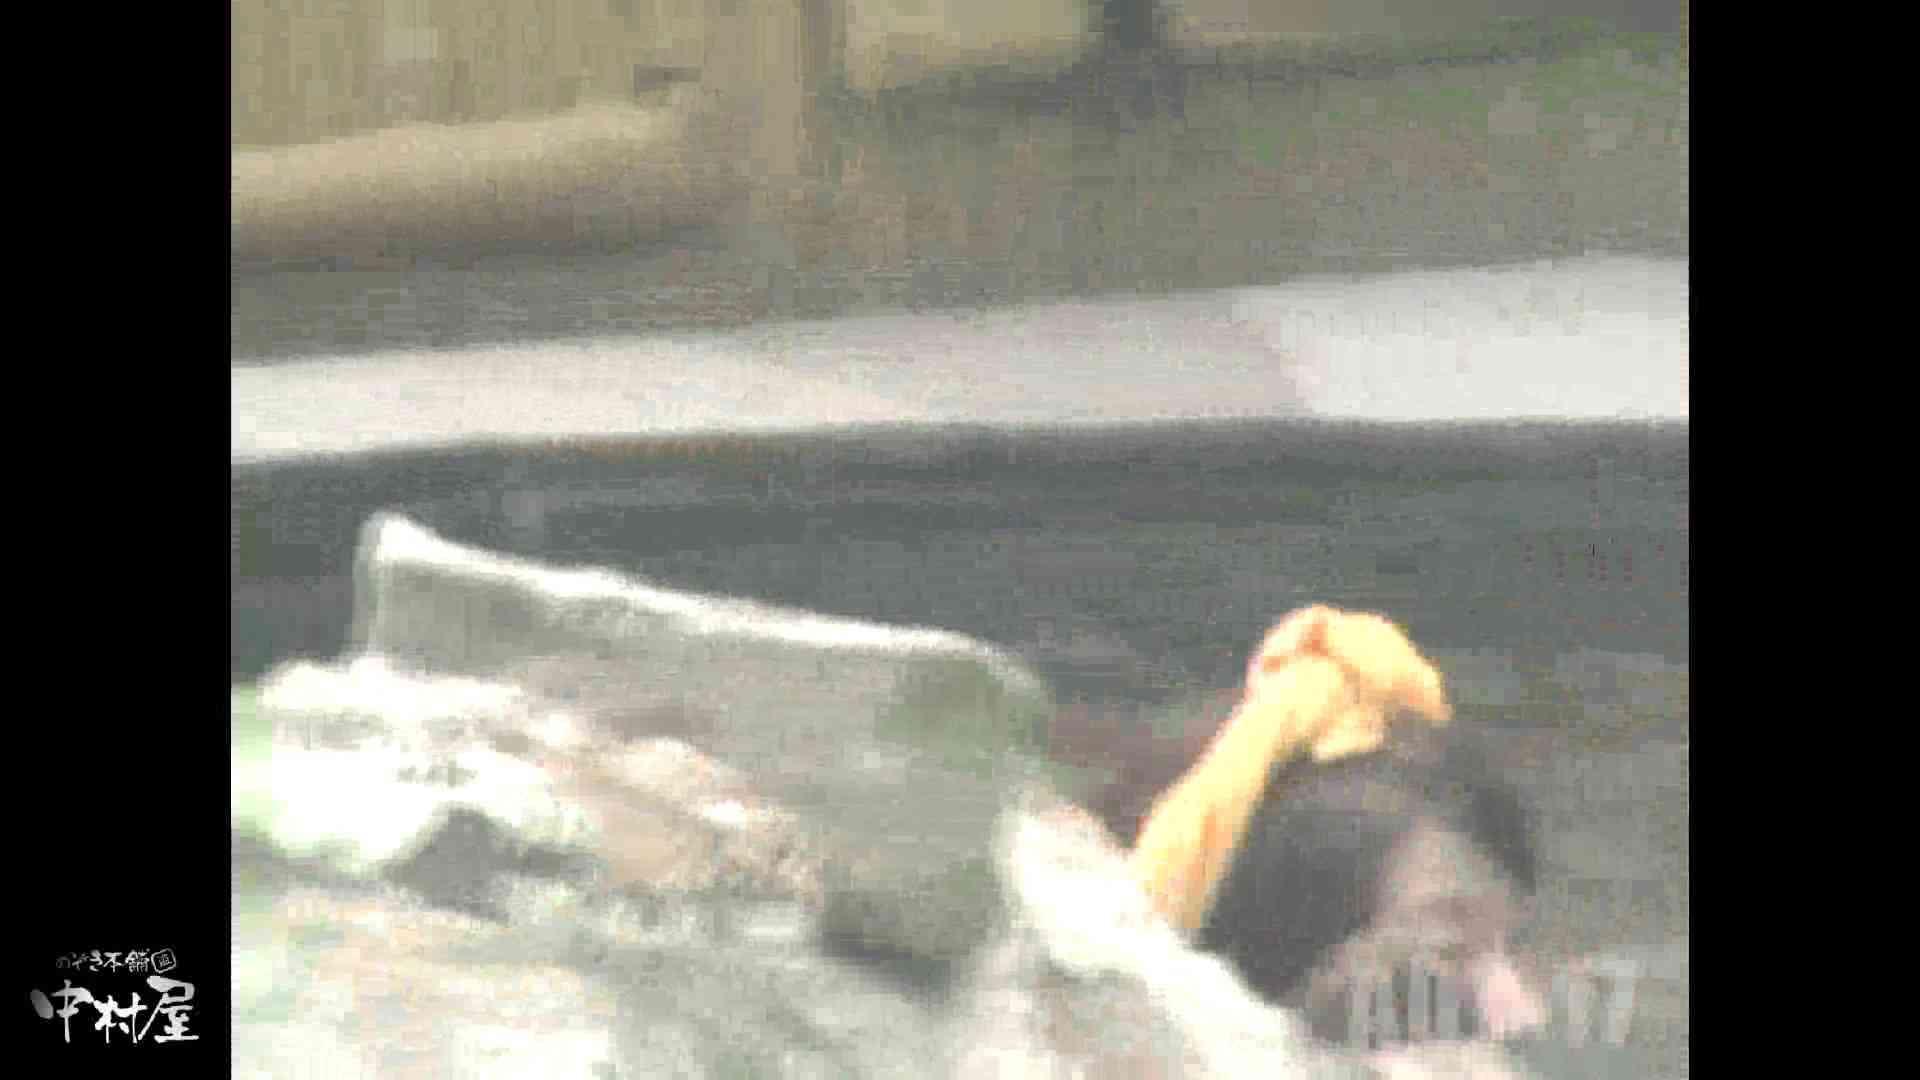 Aquaな露天風呂Vol.881潜入盗撮露天風呂十七判湯 其の五 潜入  75PIX 48